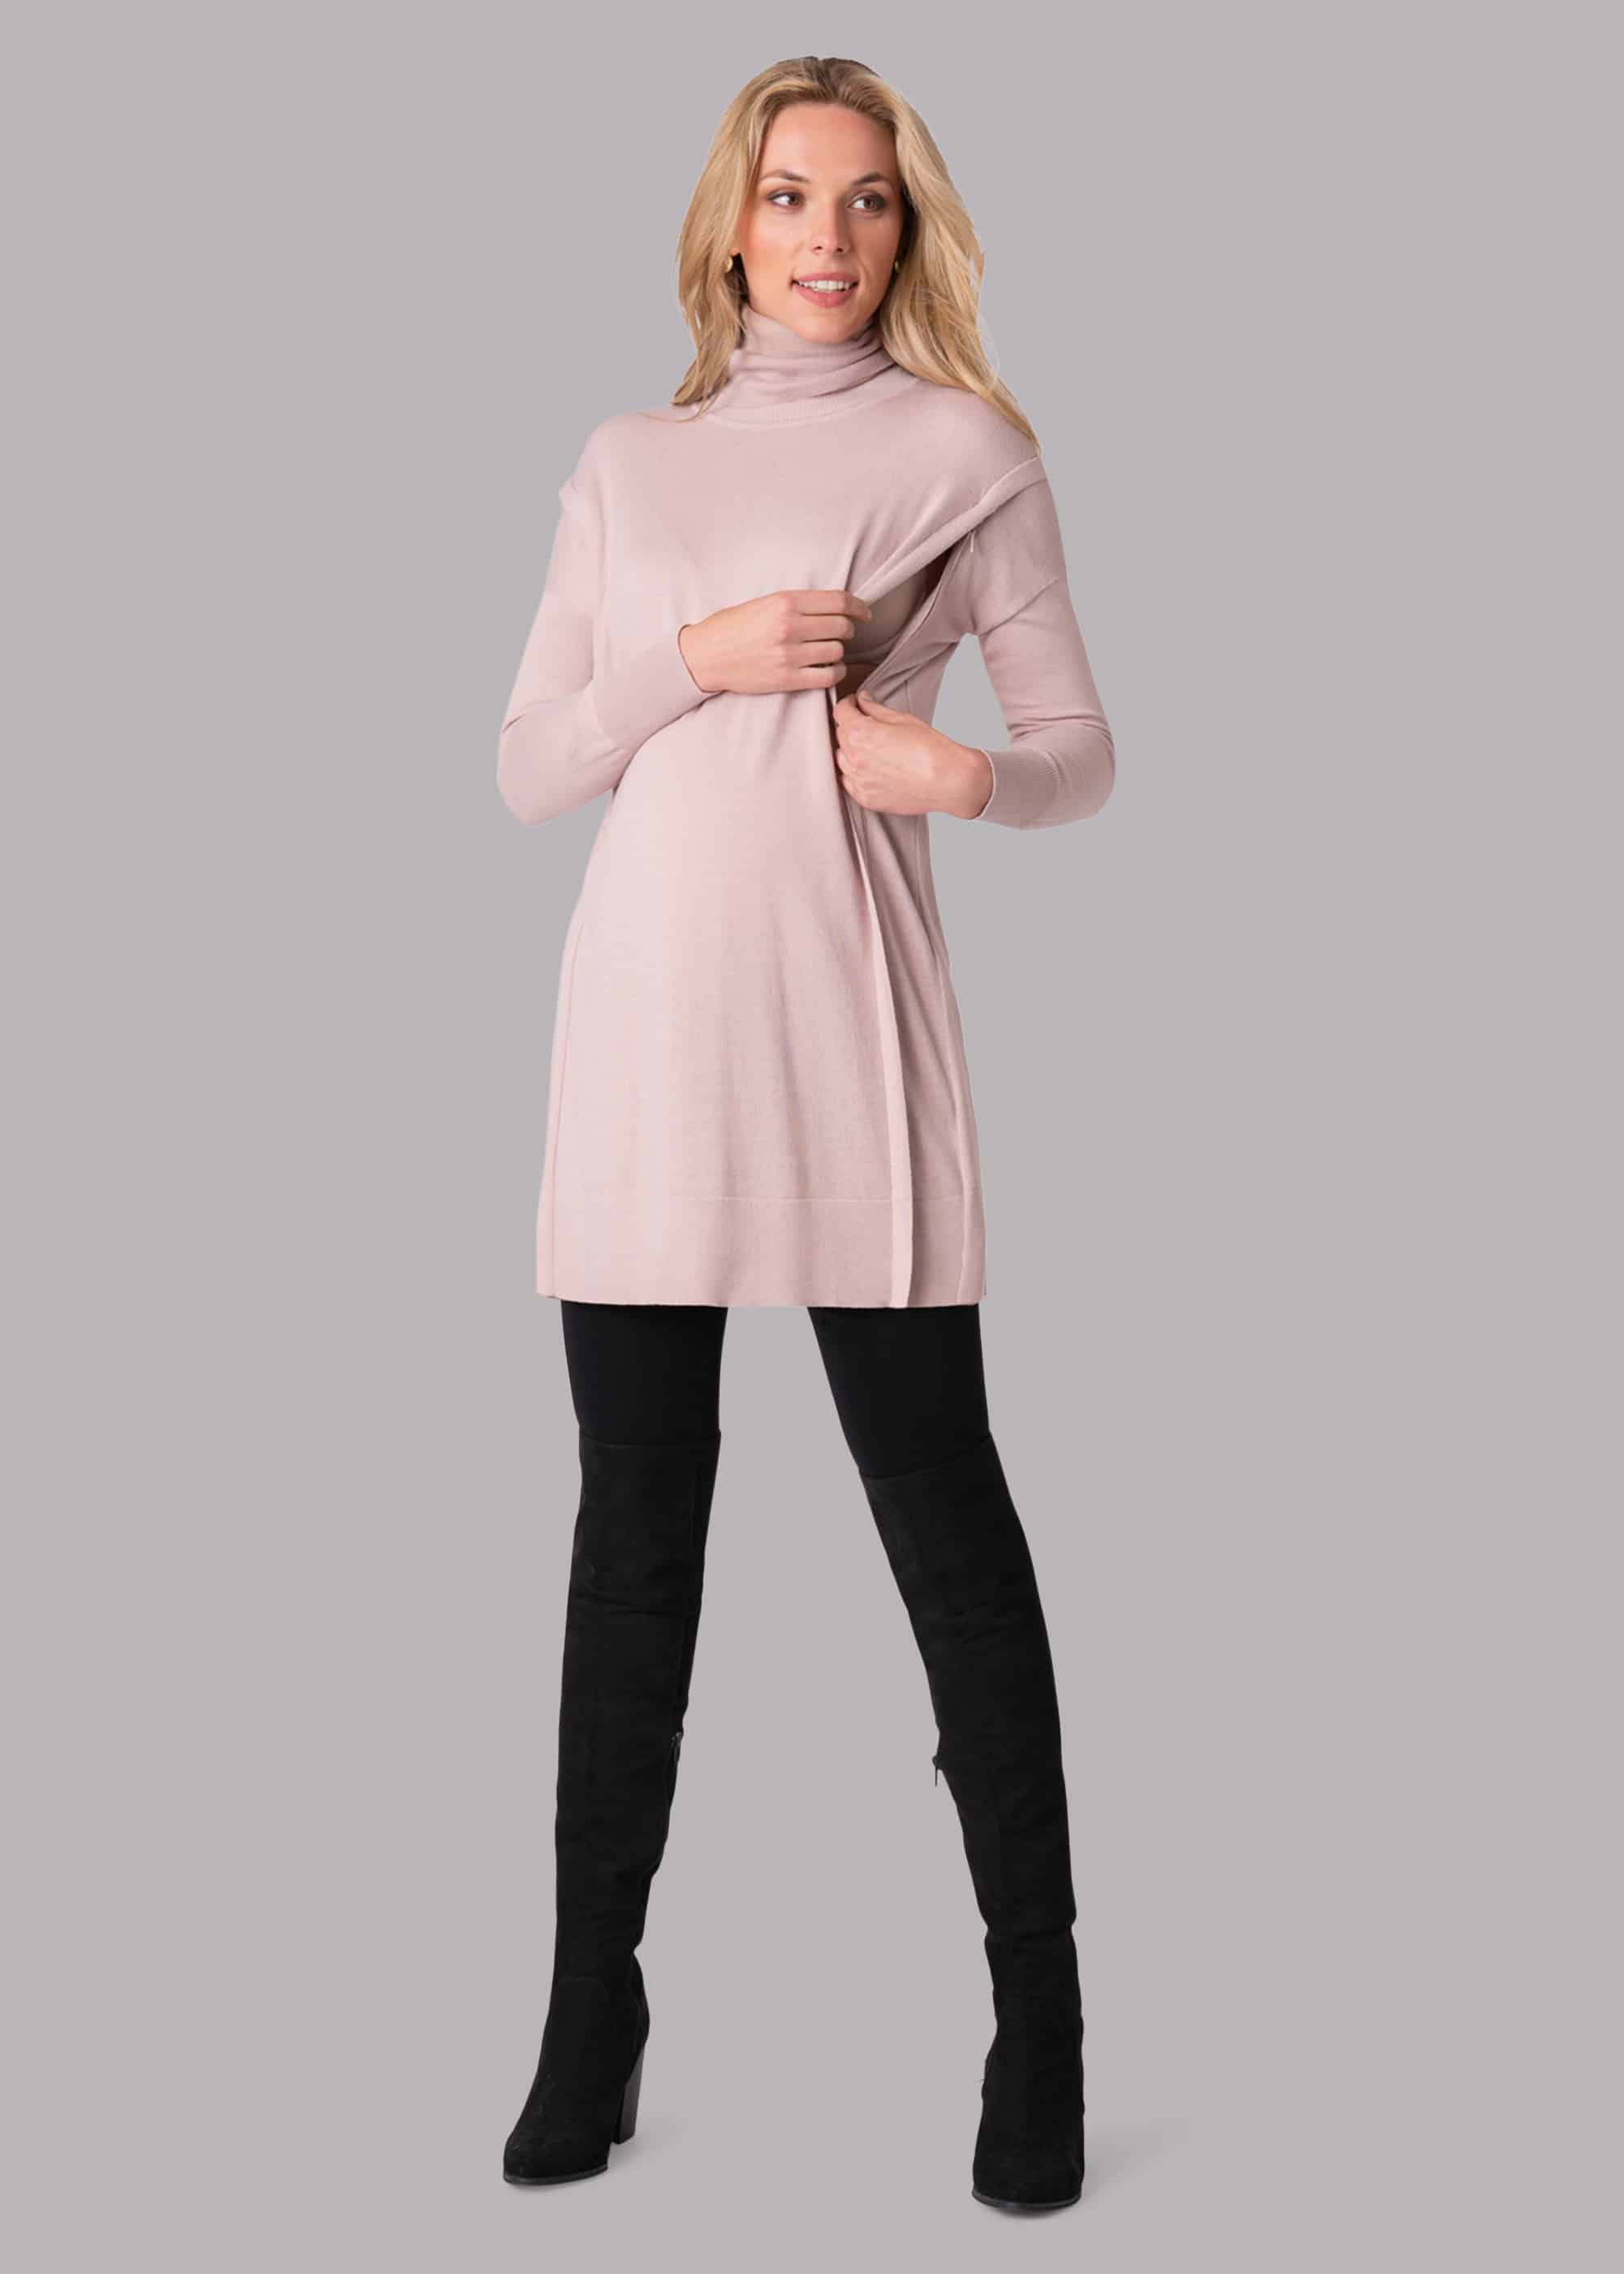 Seraphine Women Veronica Oversized Tunic Top